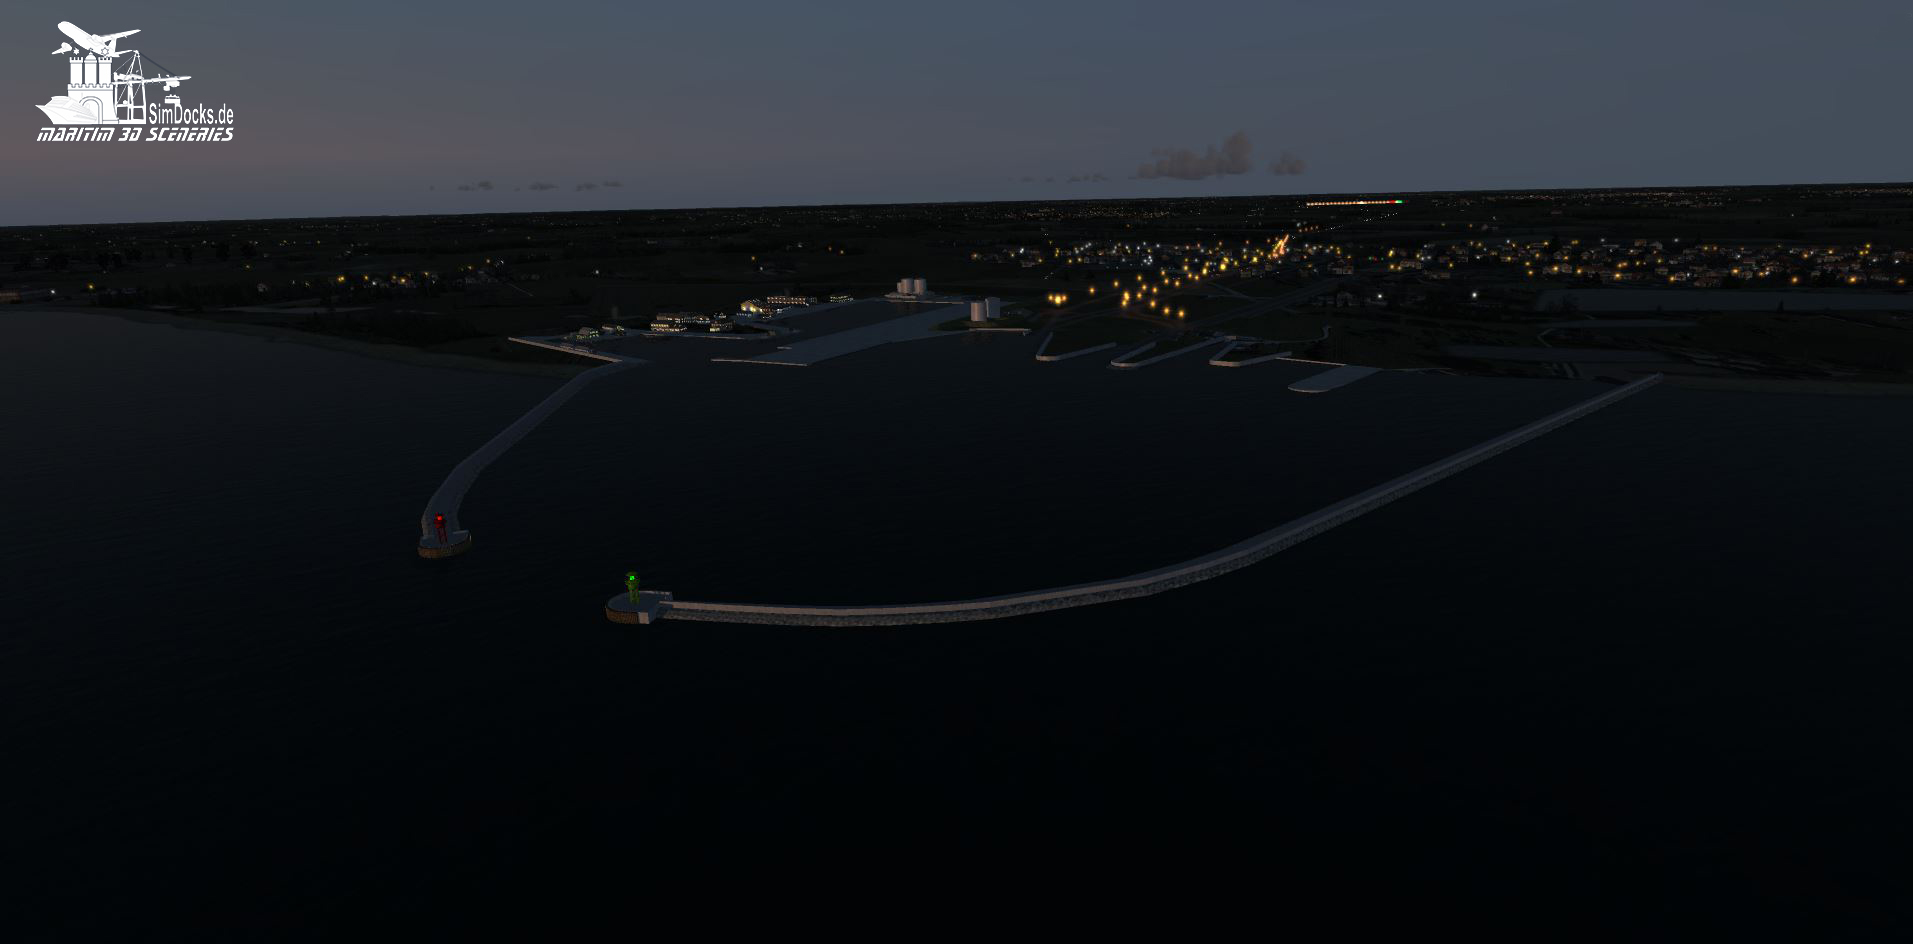 Rødbyhavn